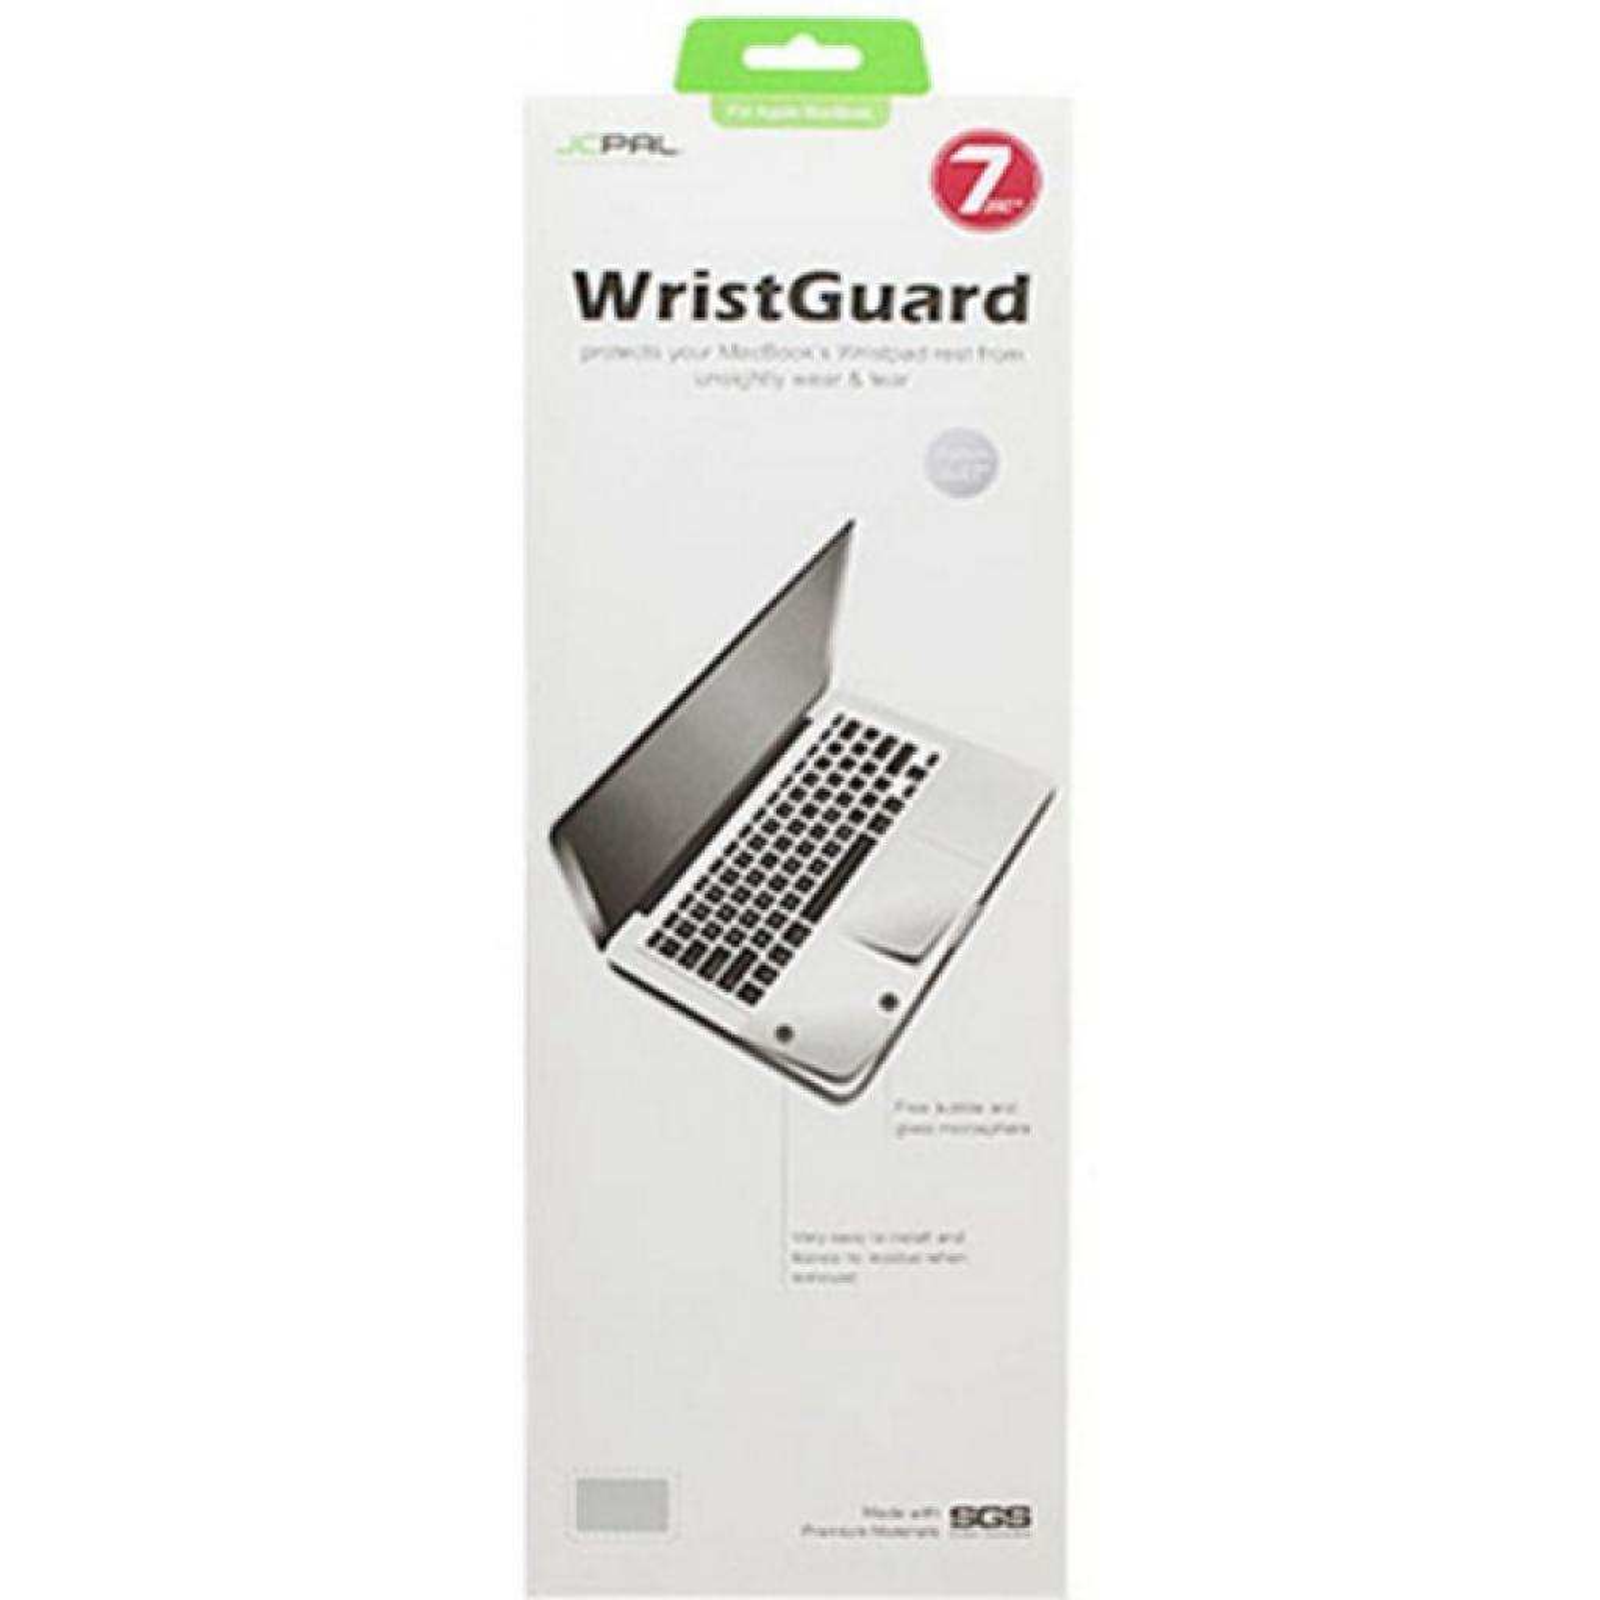 Пленка защитная JCPAL WristGuard Palm Guard для MacBook Air 11 (JCP2018)